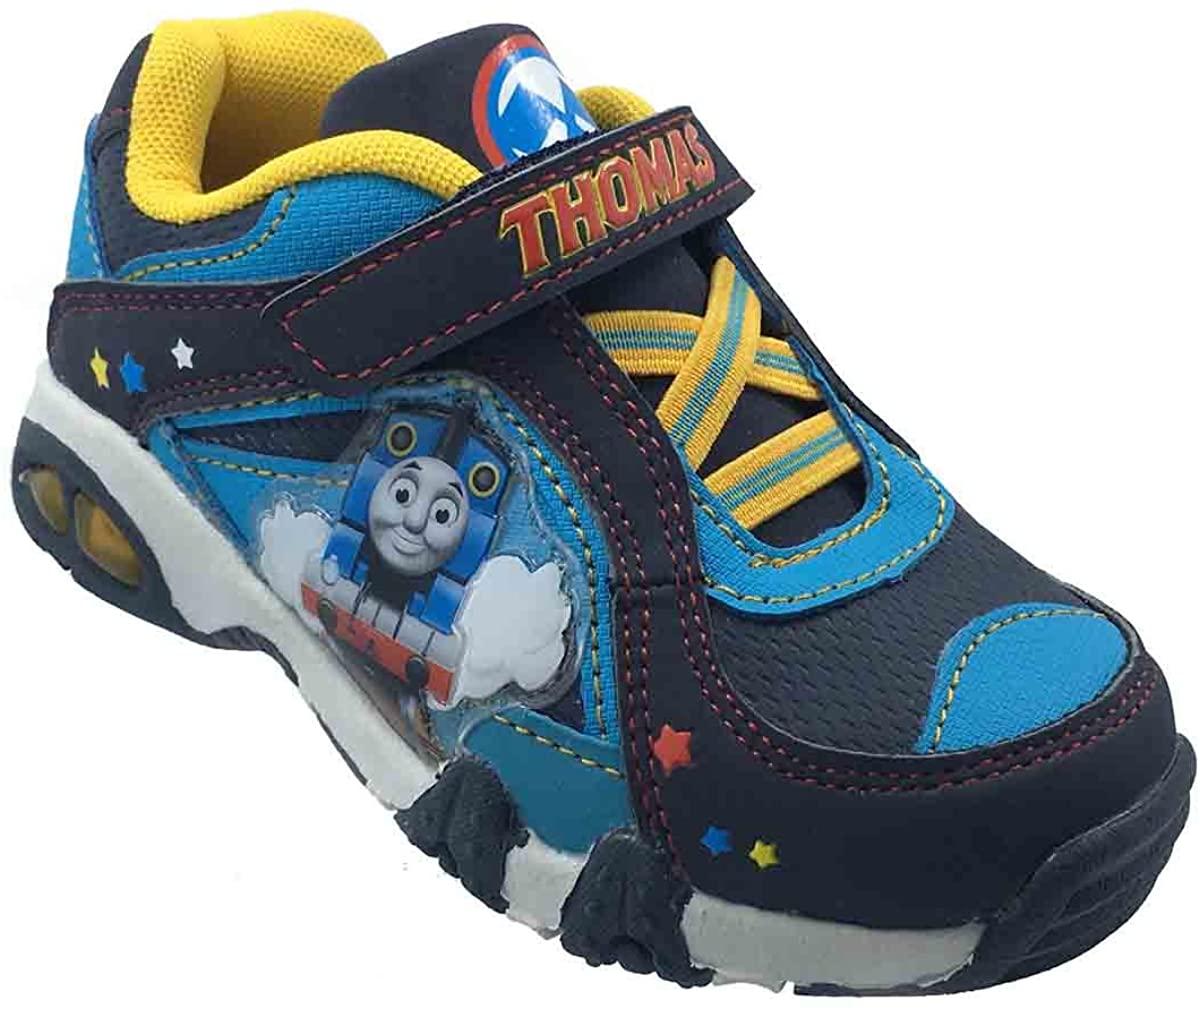 Toddler Boys Thomas Athletic Shoes (7 M US Toddler) Blue